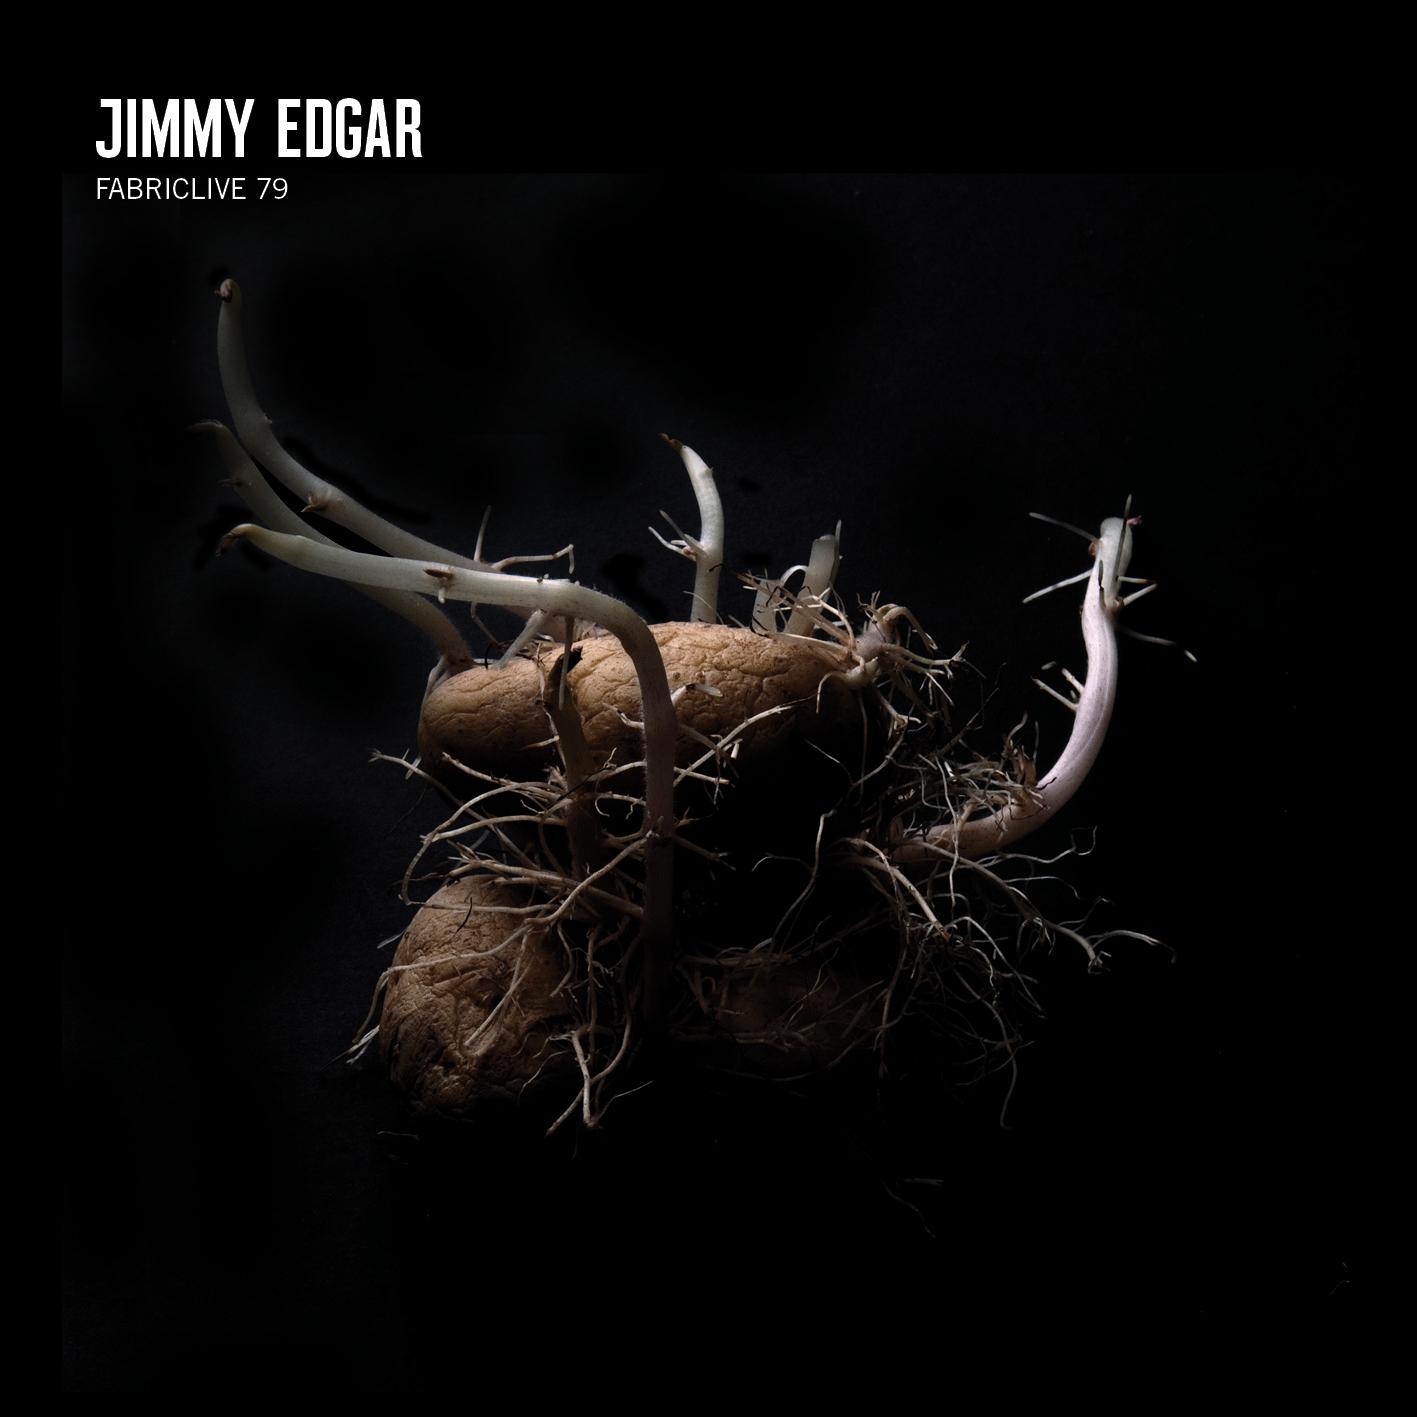 Jimmy Edgar – Fabriclive 79 (Fabric)